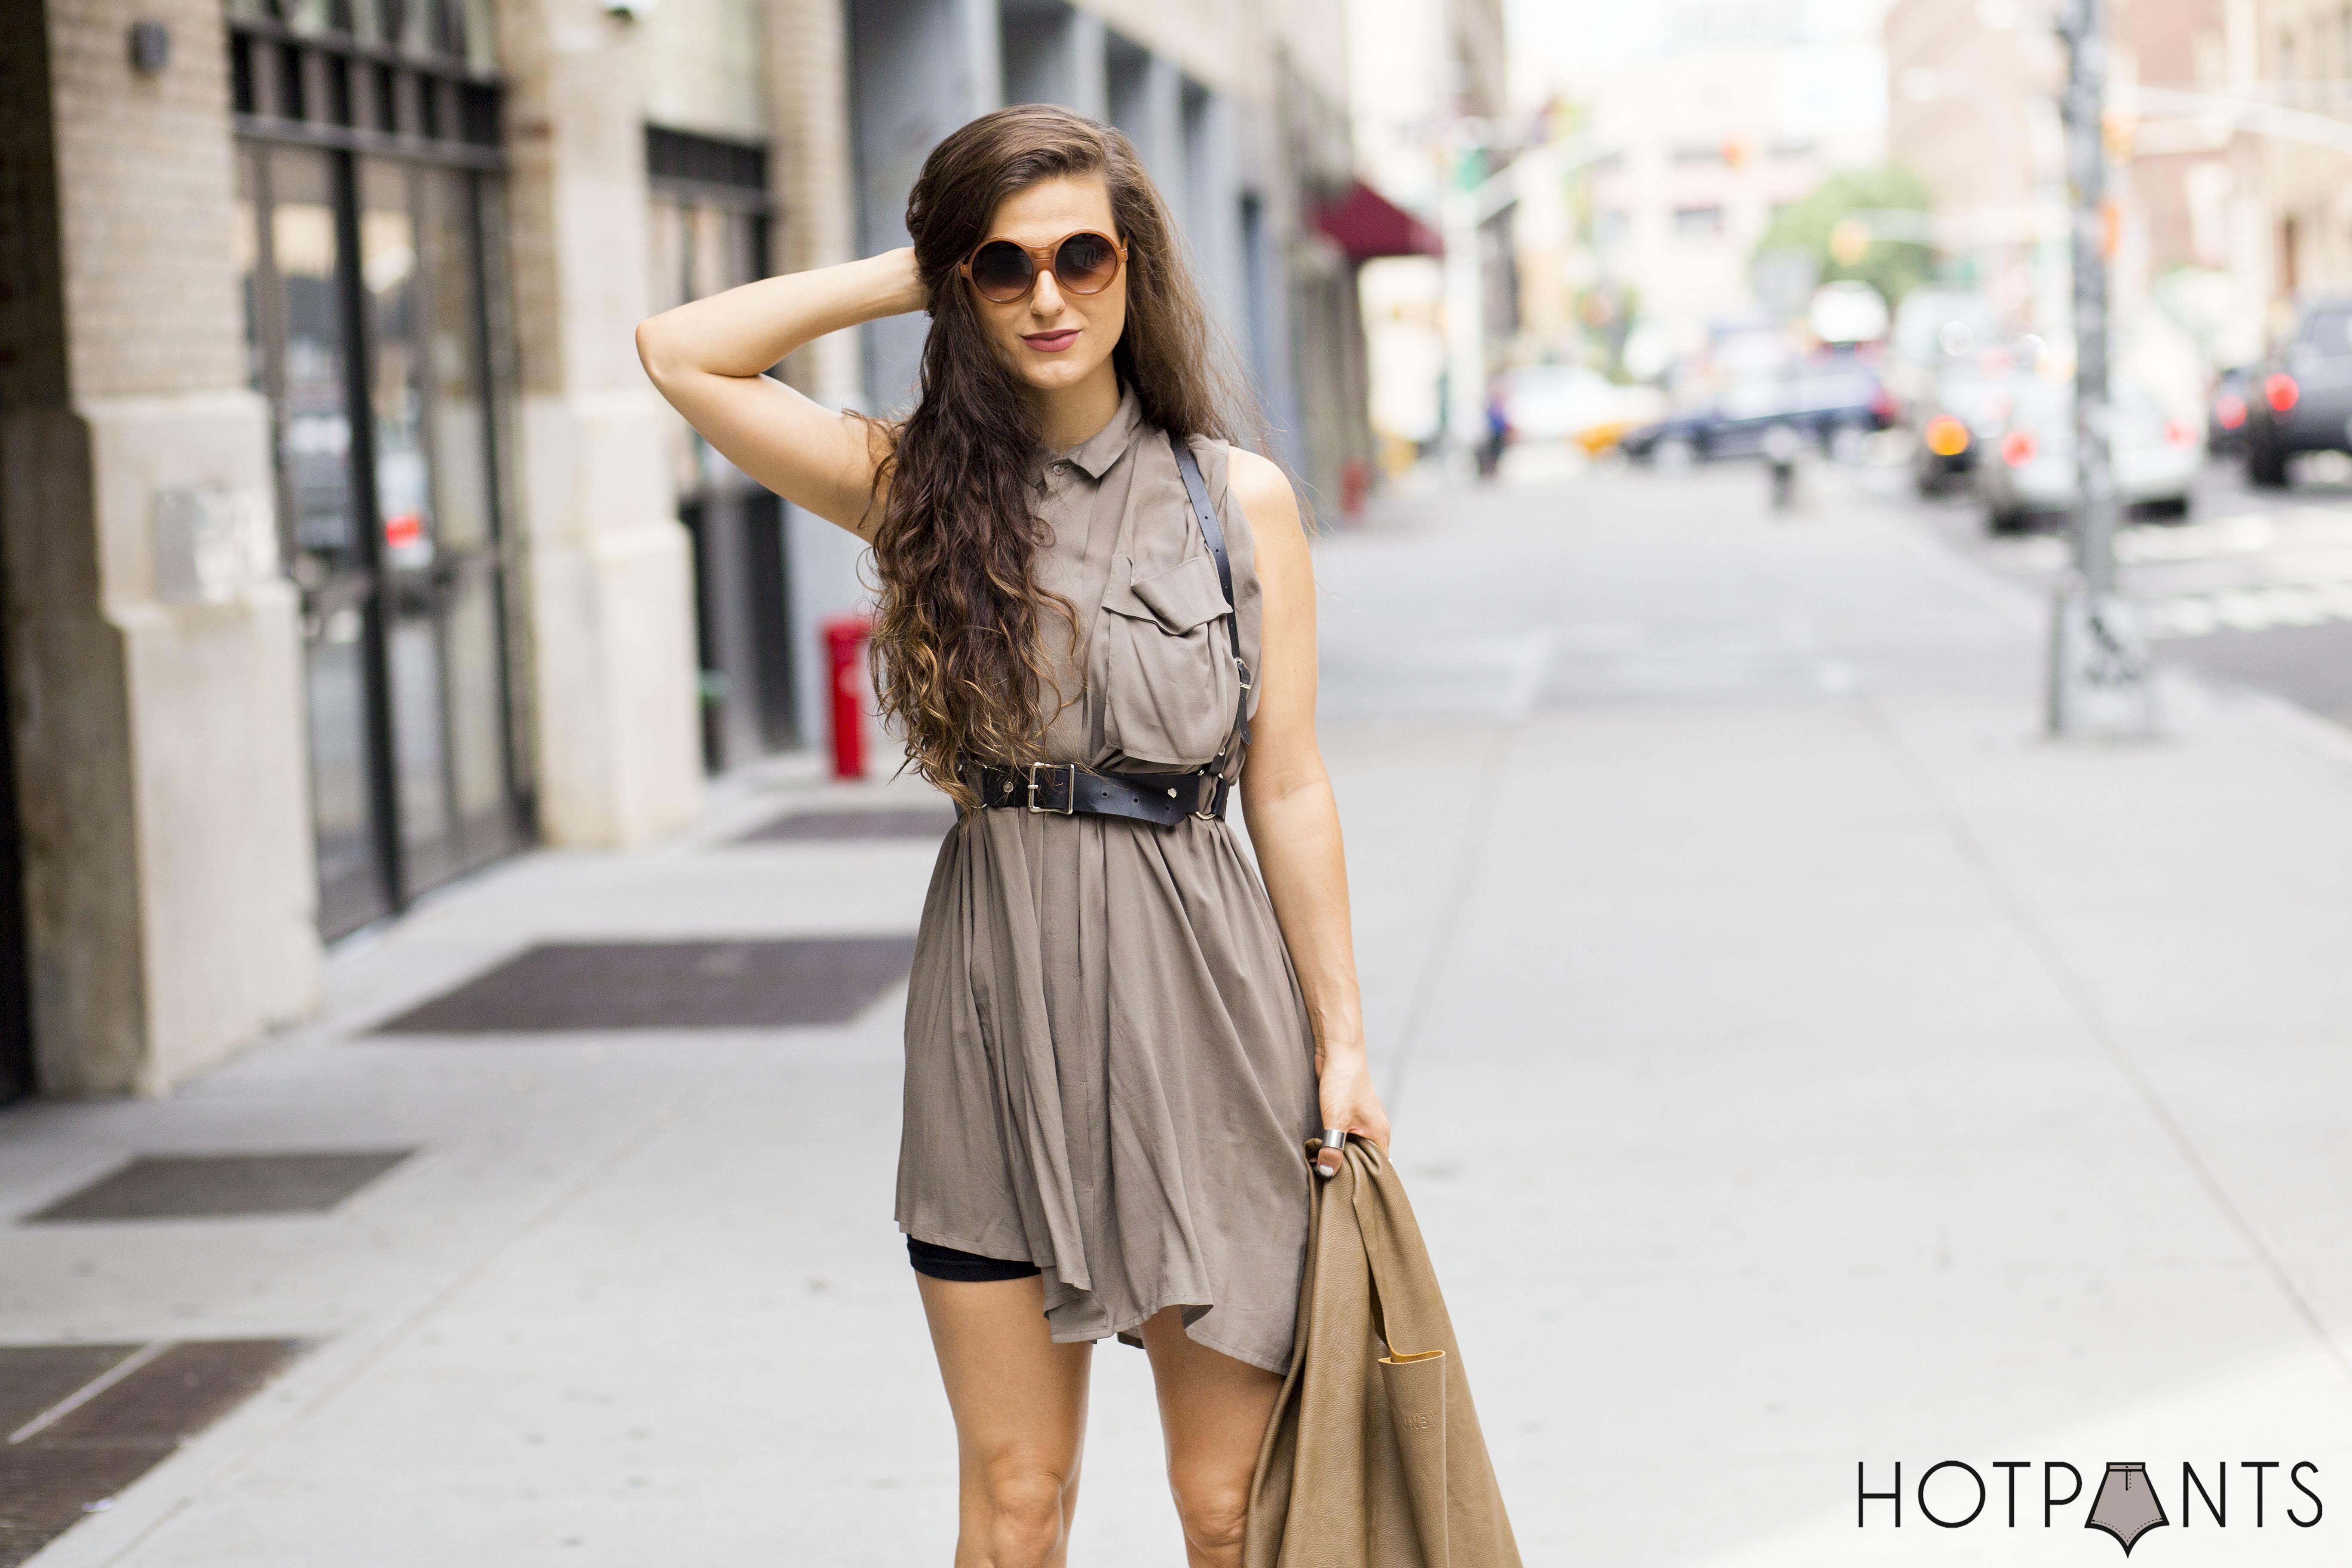 Zana Bayne Leather Harness Alexander Wang Gladiators NYC Summer Streetstyle